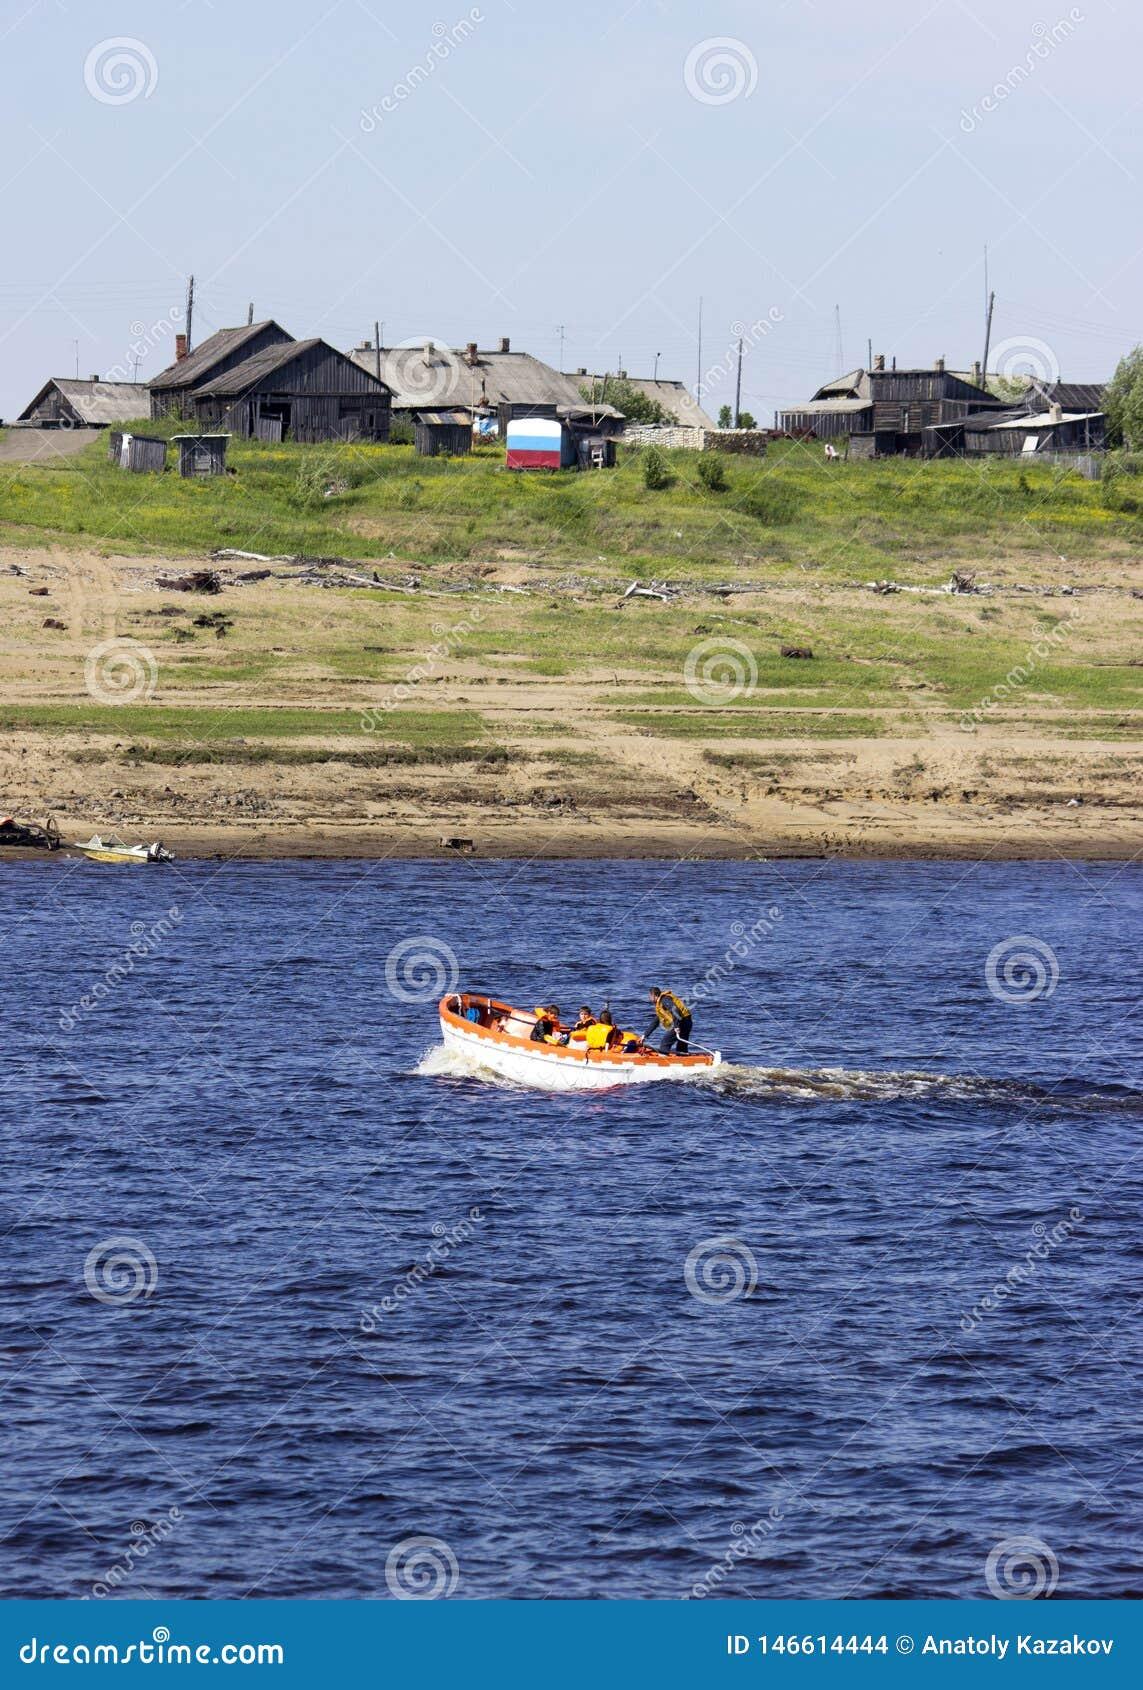 transportation of passengers on a life raft